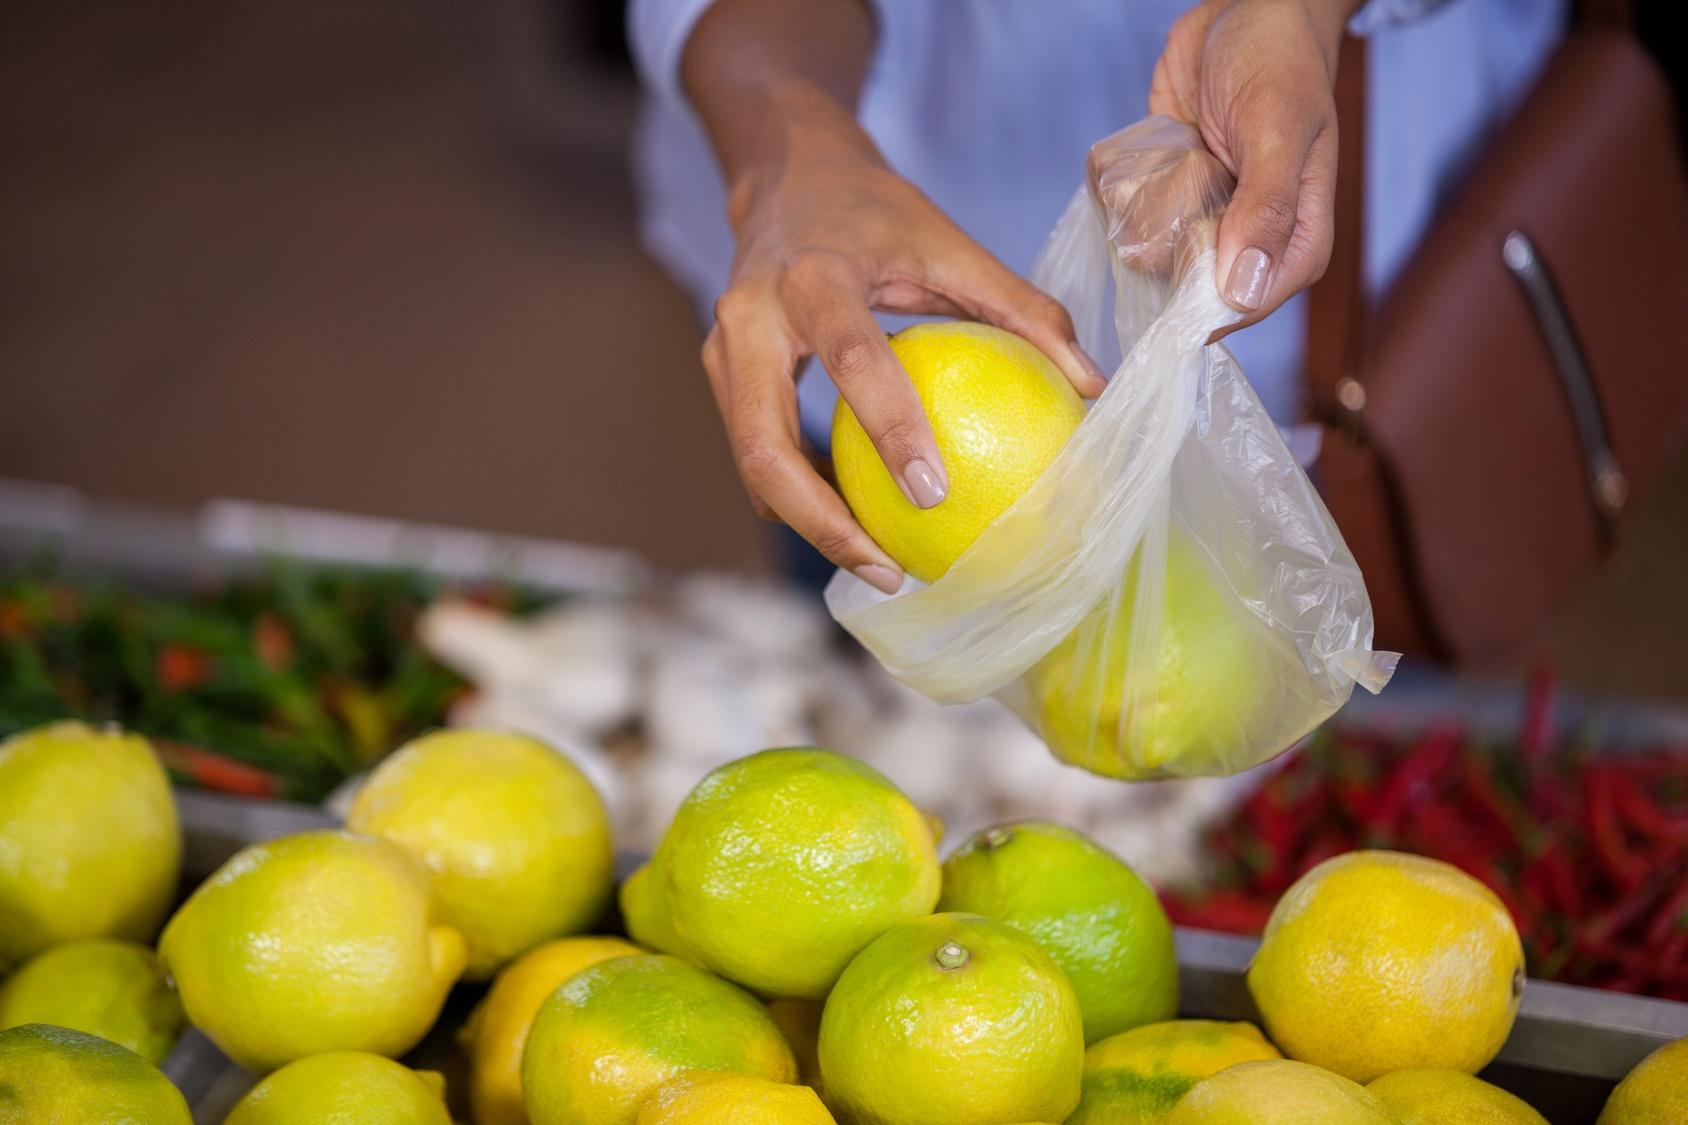 sacchetti frutta ortofrutta limoni